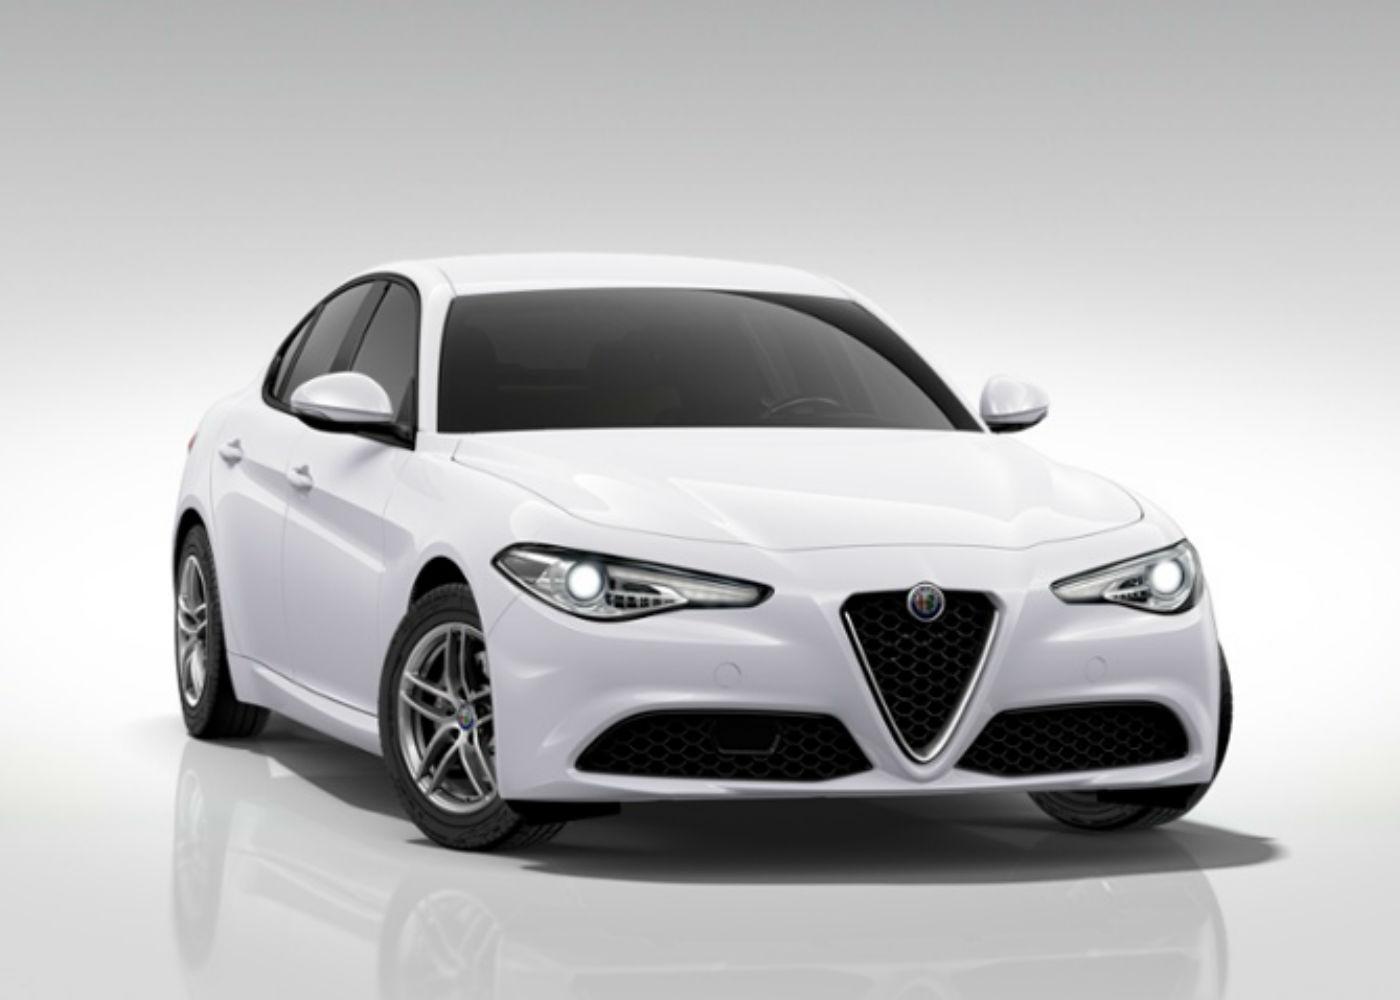 ALFA ROMEO Giulia 2.2 Turbodiesel 150 CV AT8 Bianco Alfa Km 0